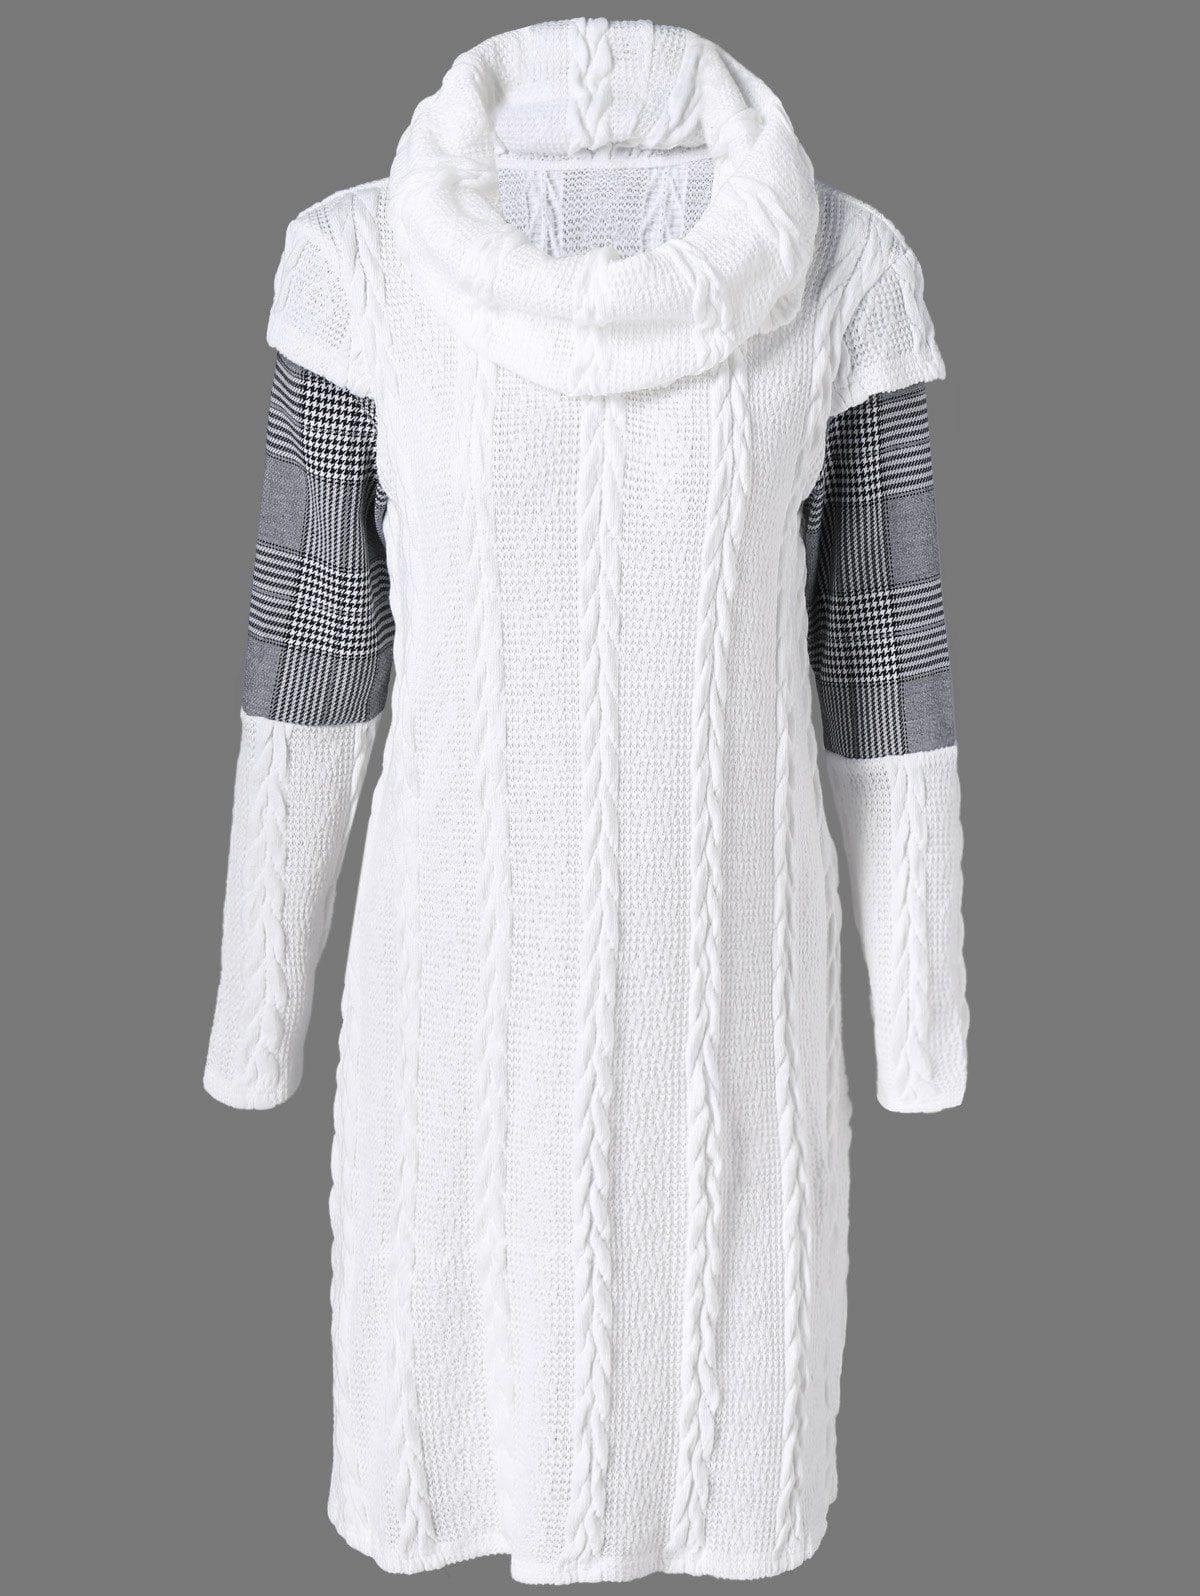 0eebc1abeae Plaid Cowl Neck Jumper Dress in 2019